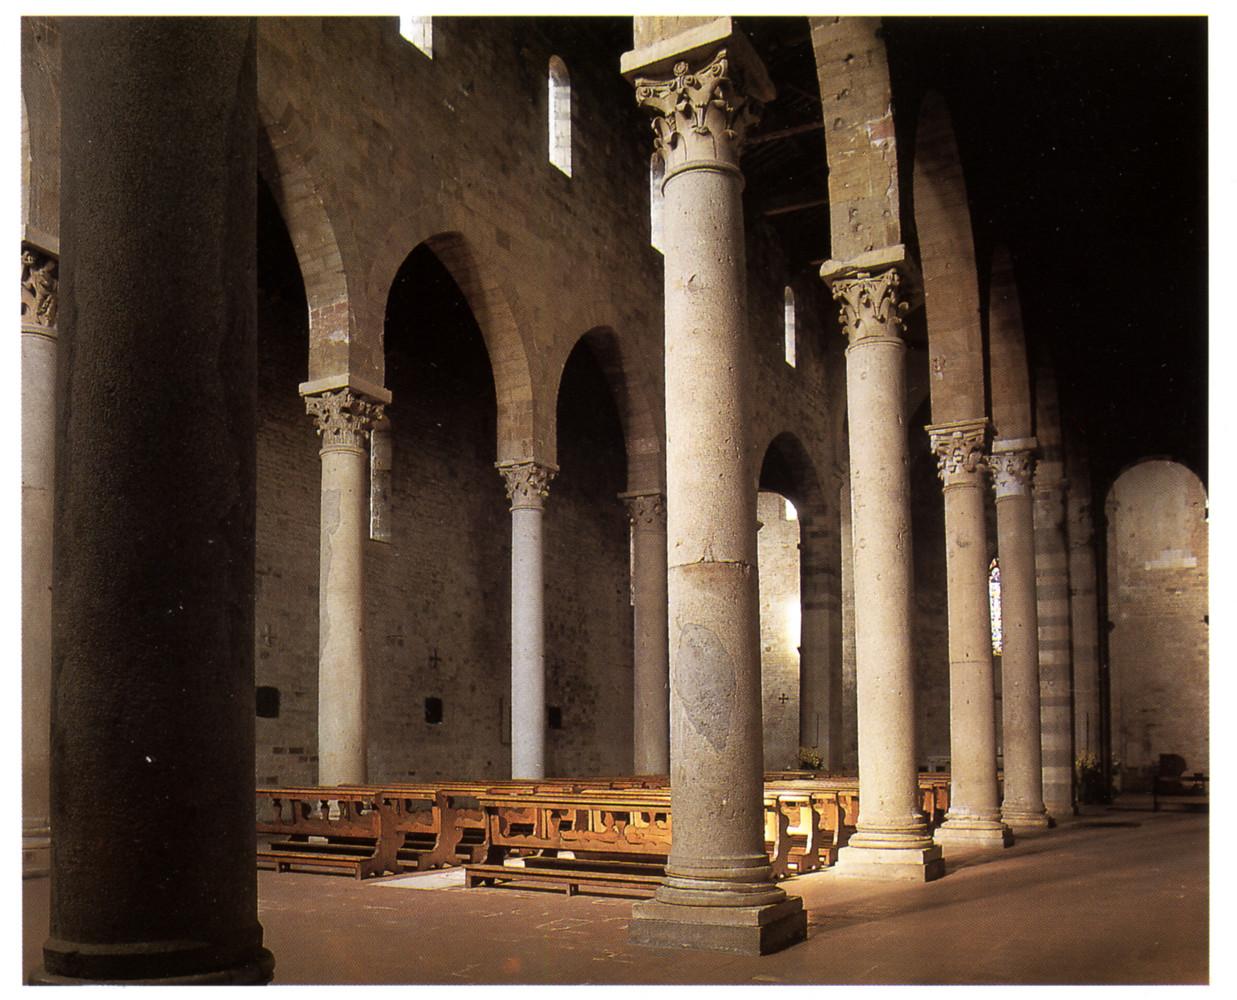 Pisa – Chiesa di San Paolo a Ripa d'Arno